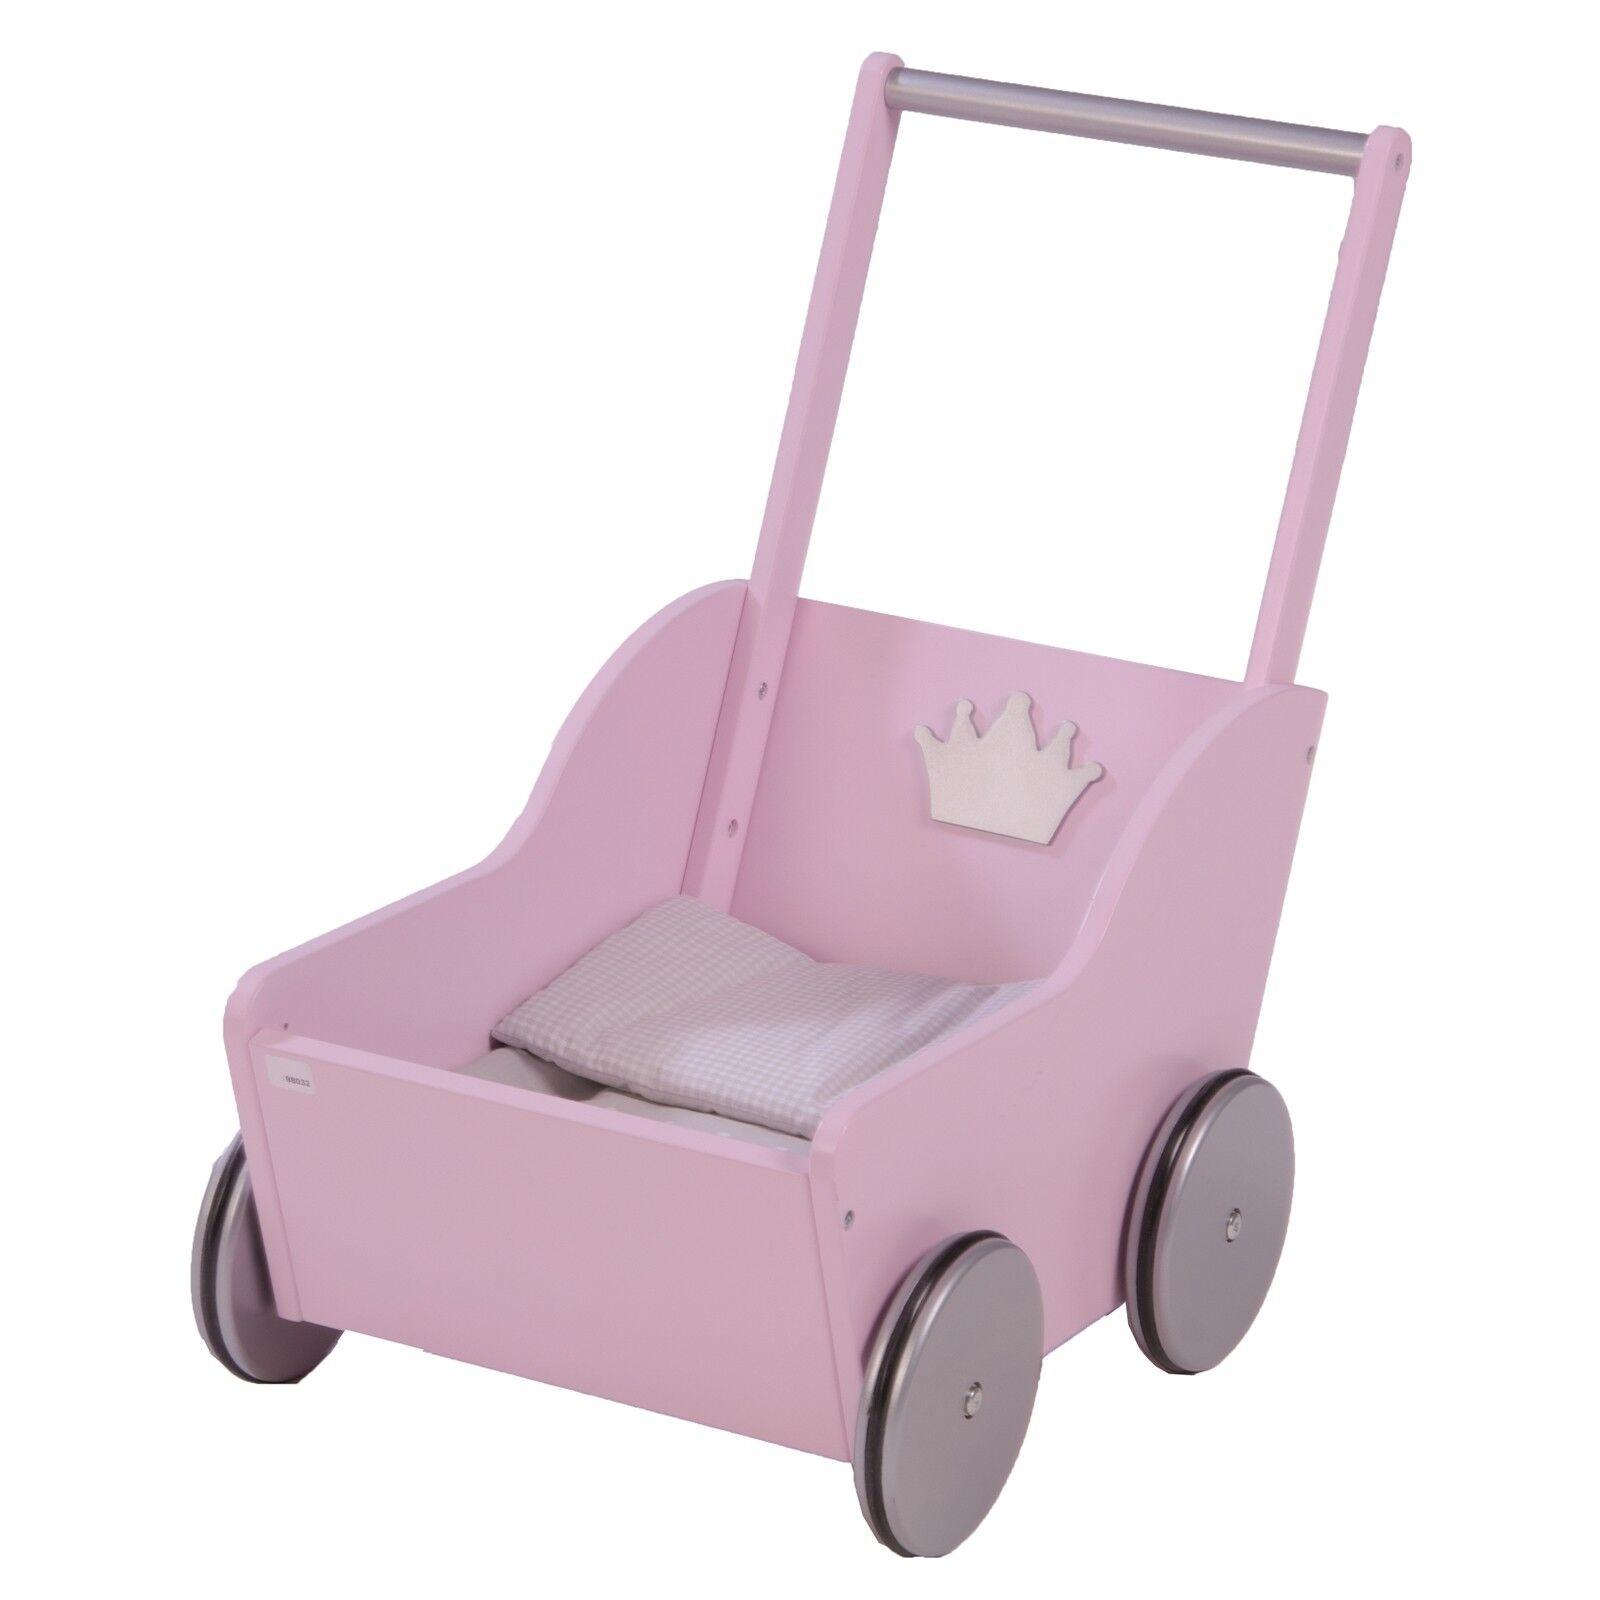 Roba Kids Puppenwagen Lauflernwagen Prinzessin Sophie Rosa    TOP e2ad10